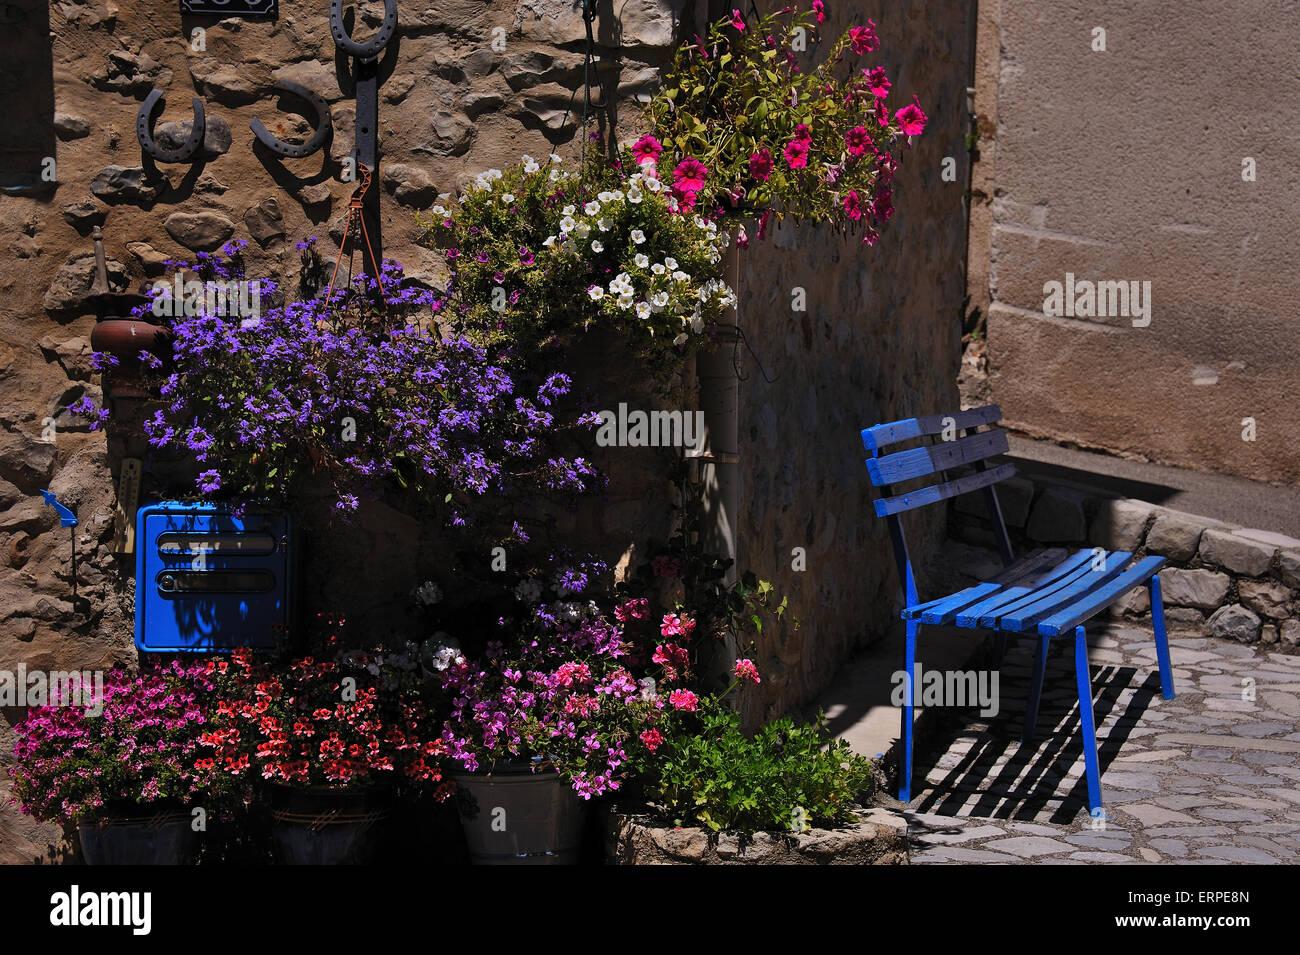 Summer Idyll in the Garden - Stock Image